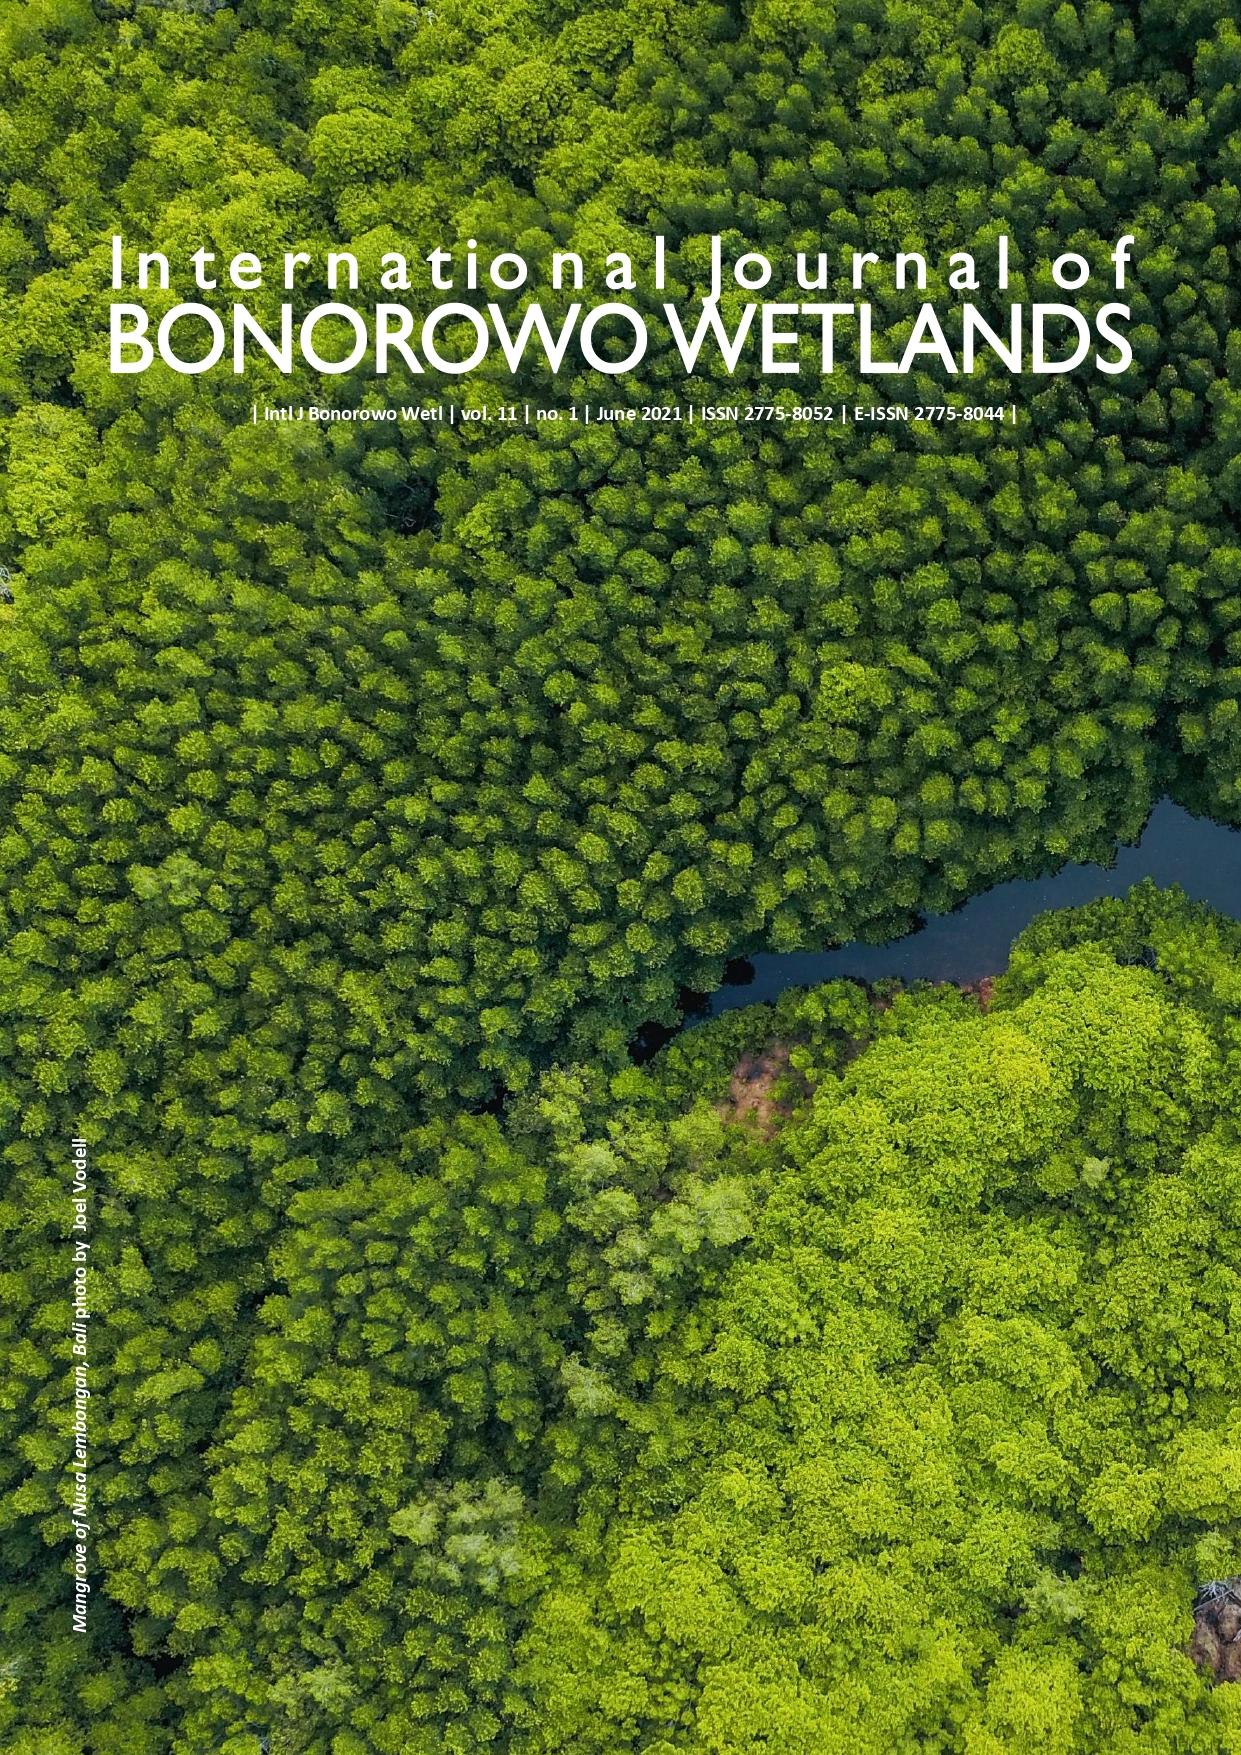 International Journal of Bonorowo Wetlands